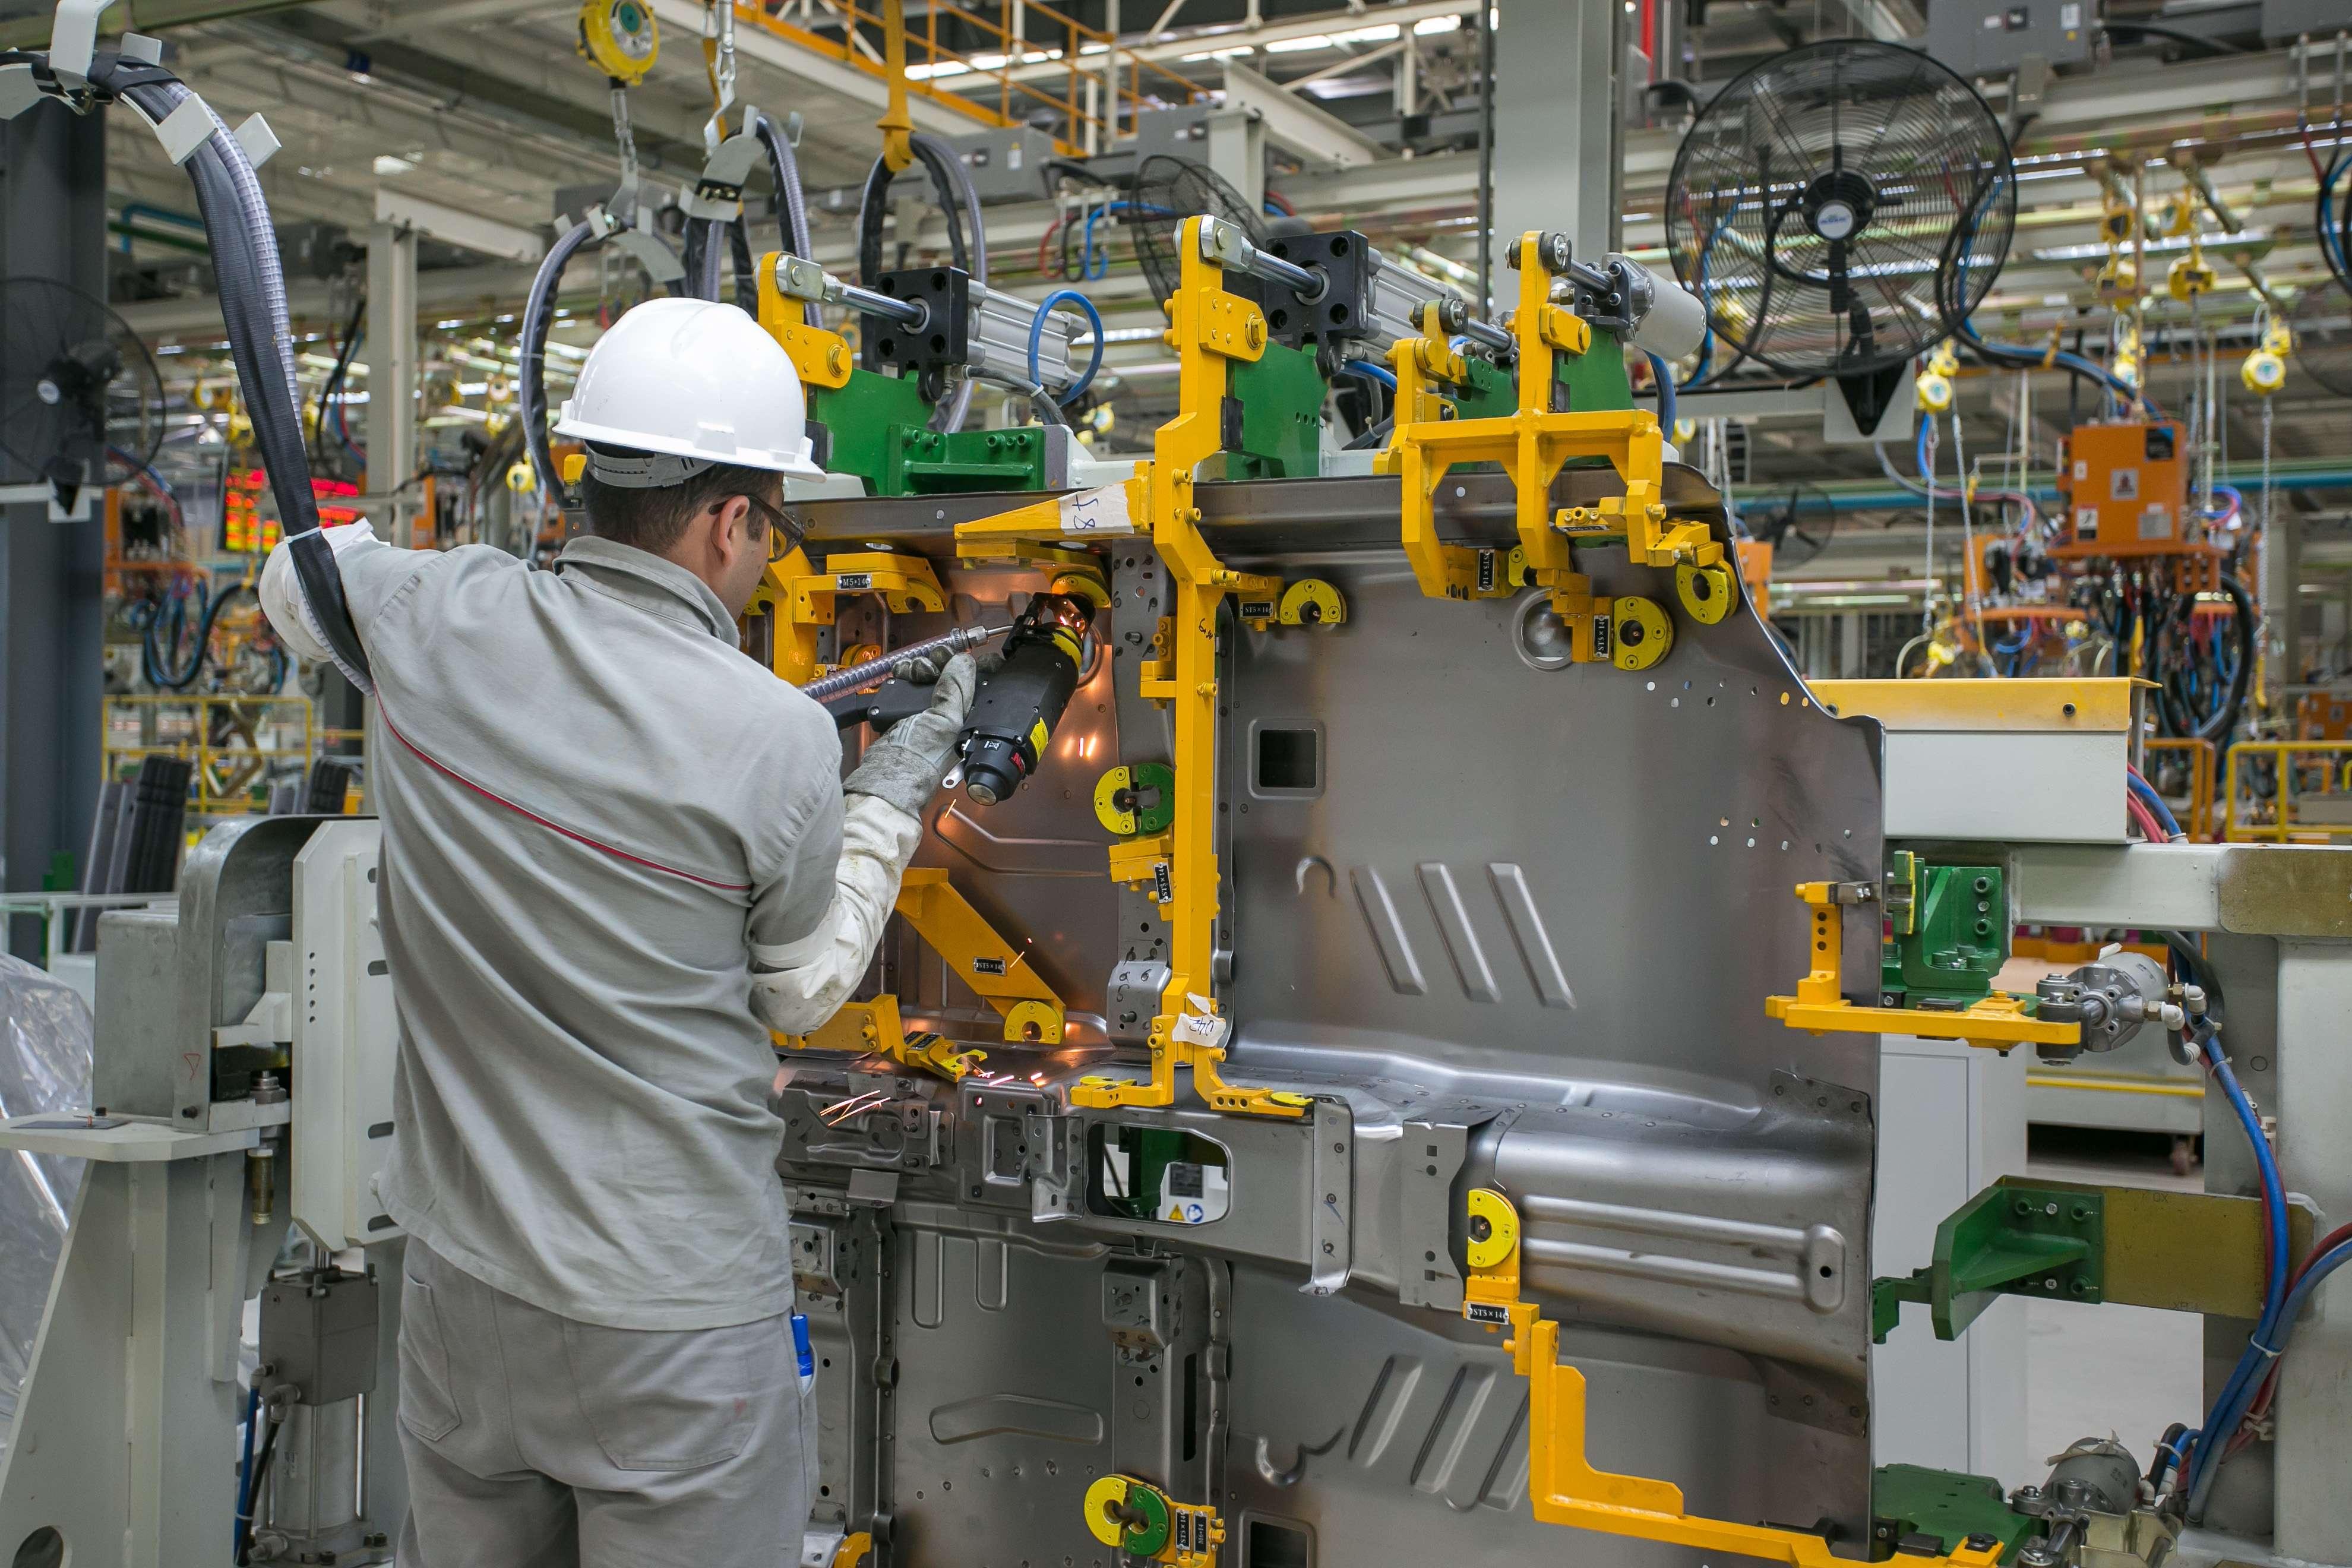 Chery inaugura primeira fábrica de carros chinesa no Brasil